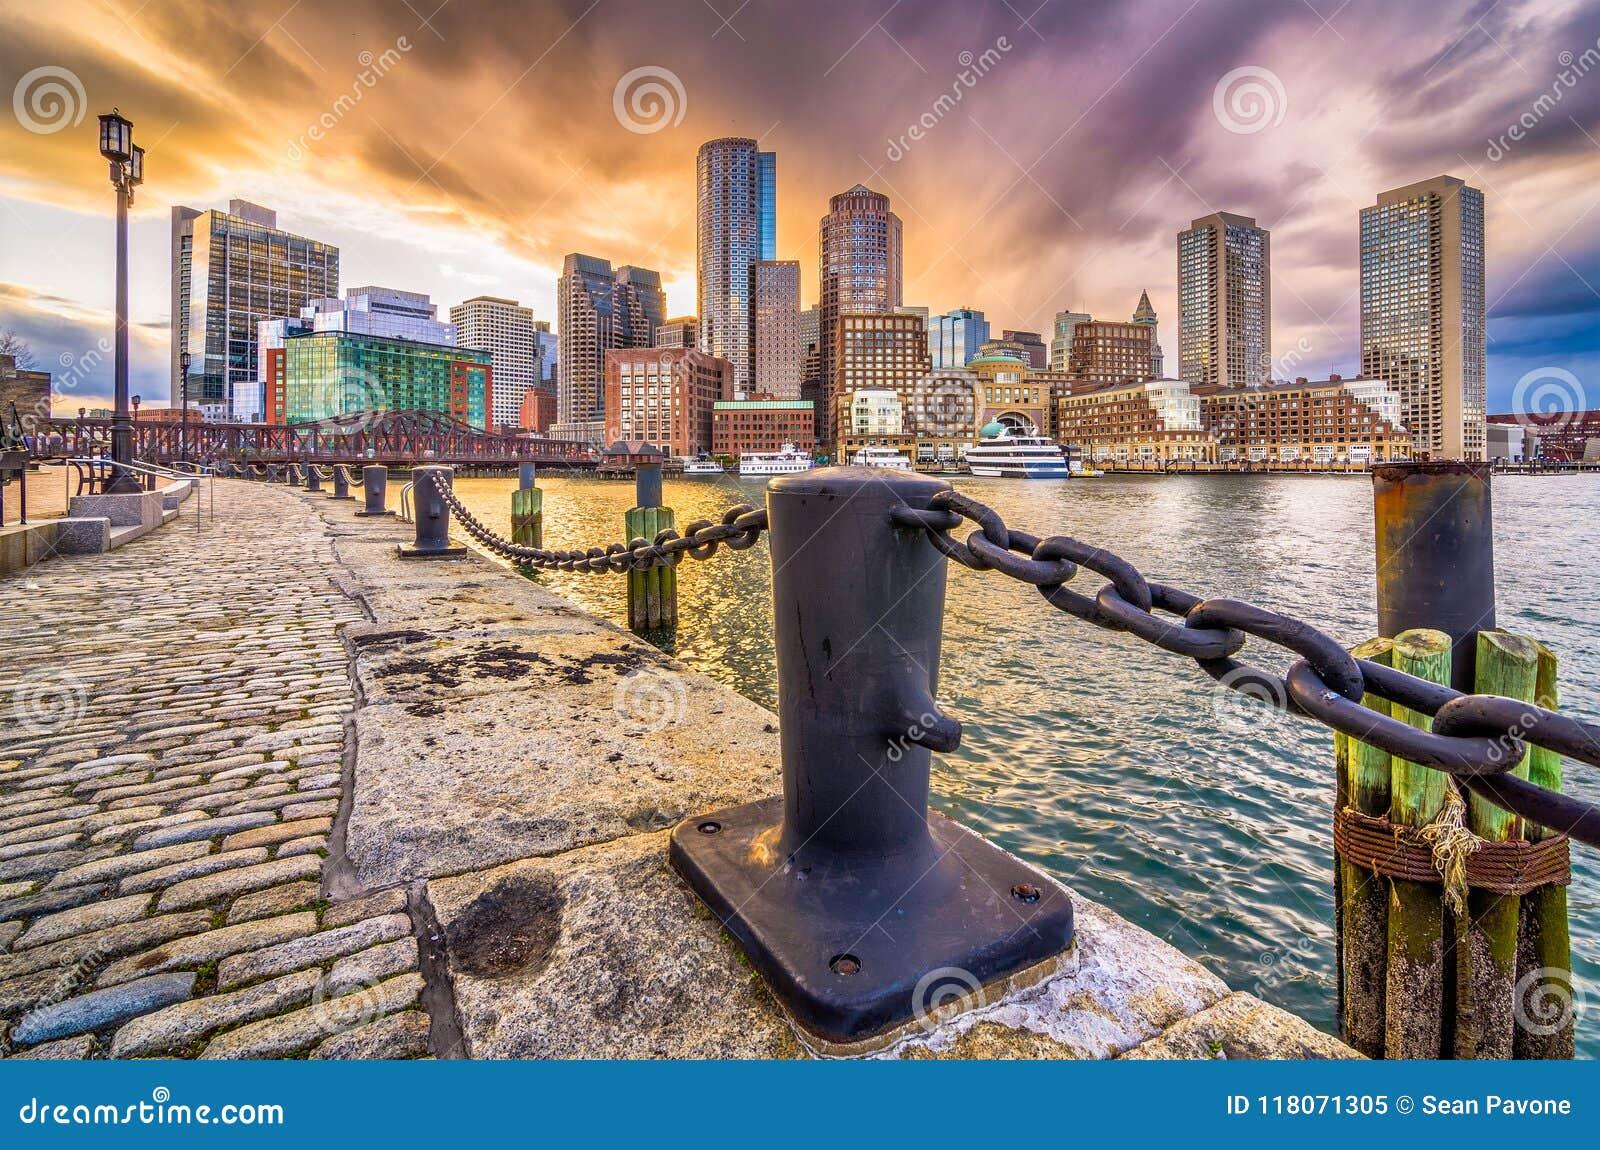 Download Boston, Massachusetts, USA Harbor And Skyline Stock Image - Image of high, financial: 118071305